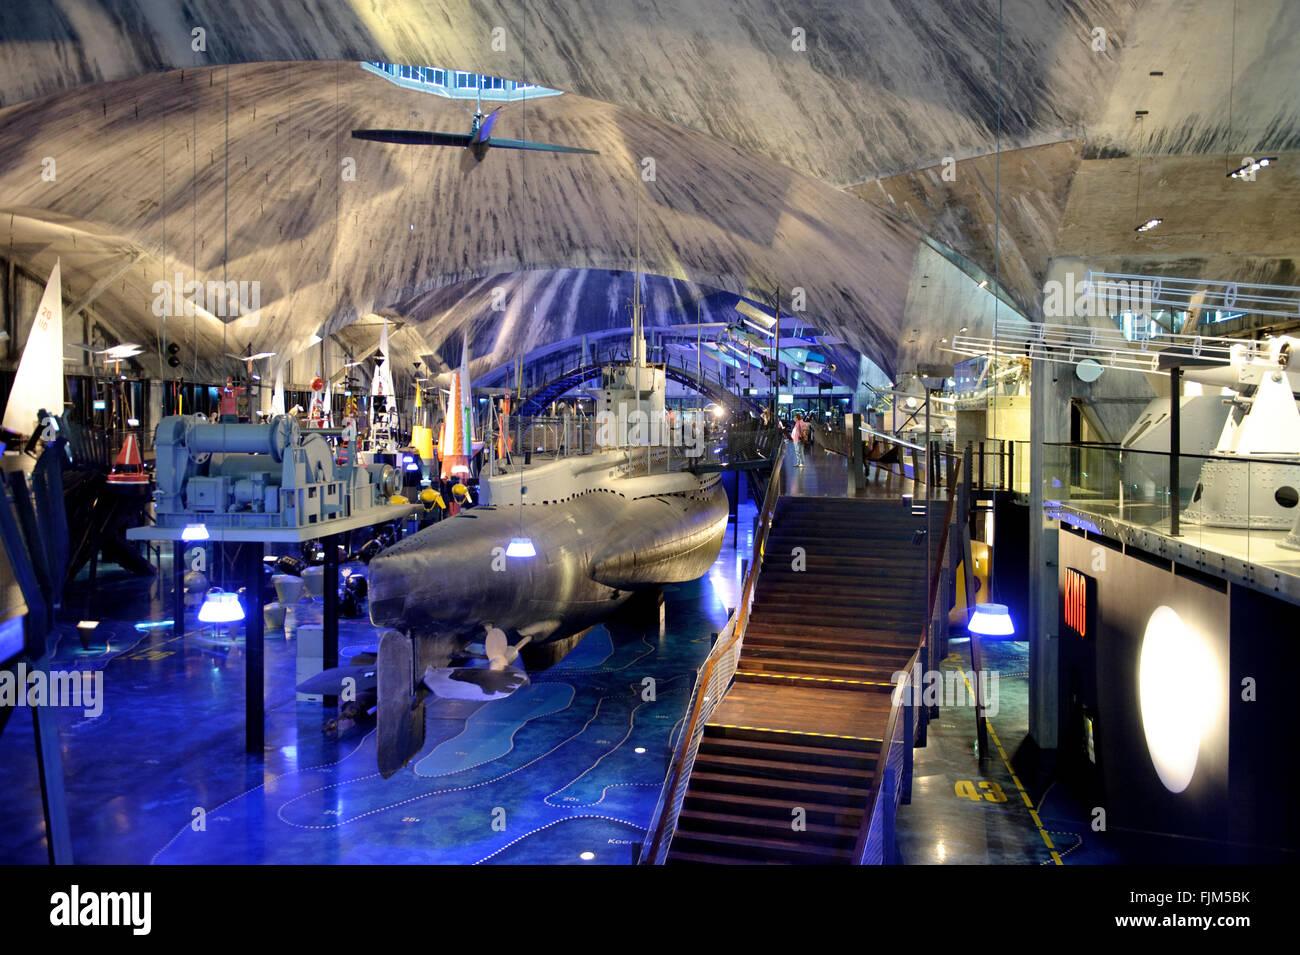 Geographie/Reisen, Estland, Tallinn, Museum/Museen, Maritime Museum, Innenansicht, Additional-Rights - Clearance Stockbild